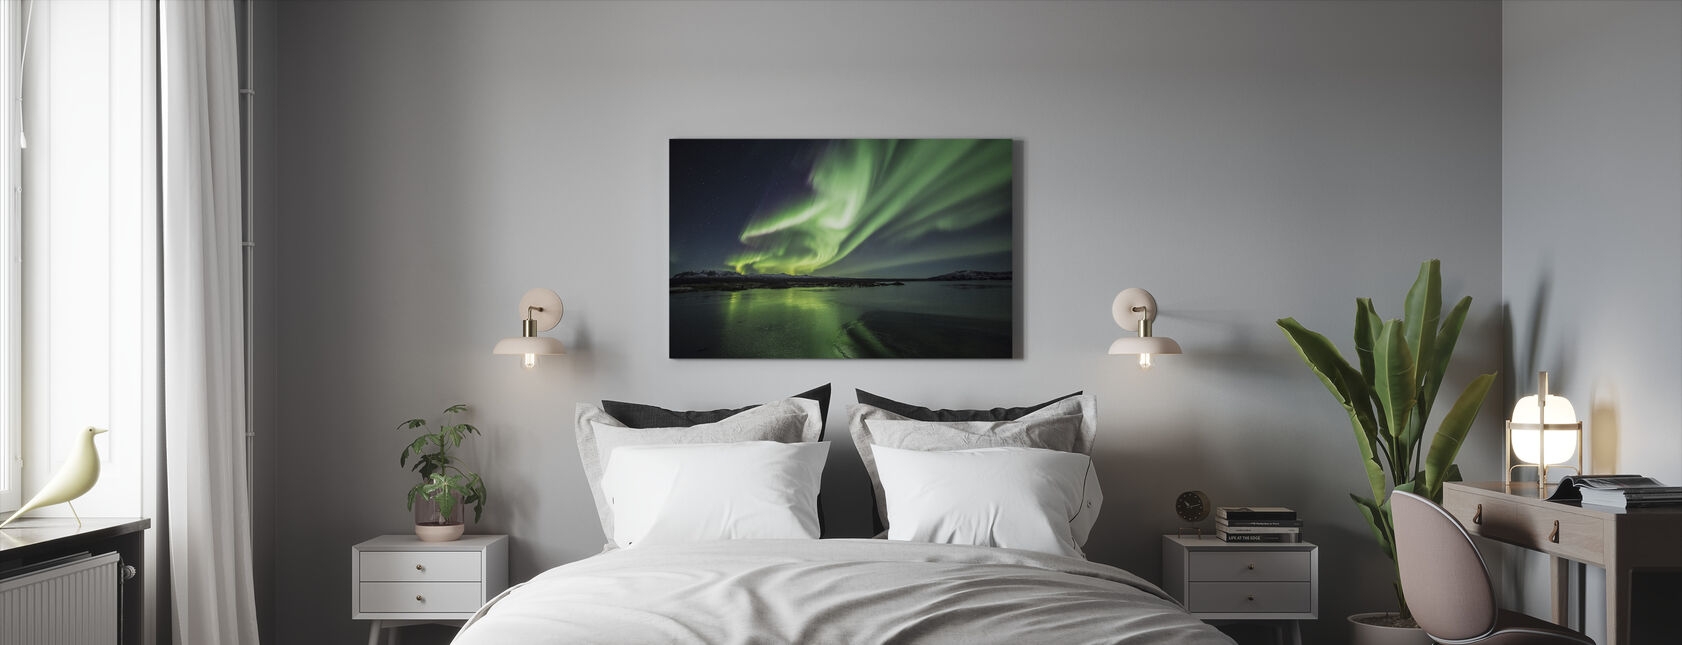 Lumoava Aurora Borealis - Canvastaulu - Makuuhuone